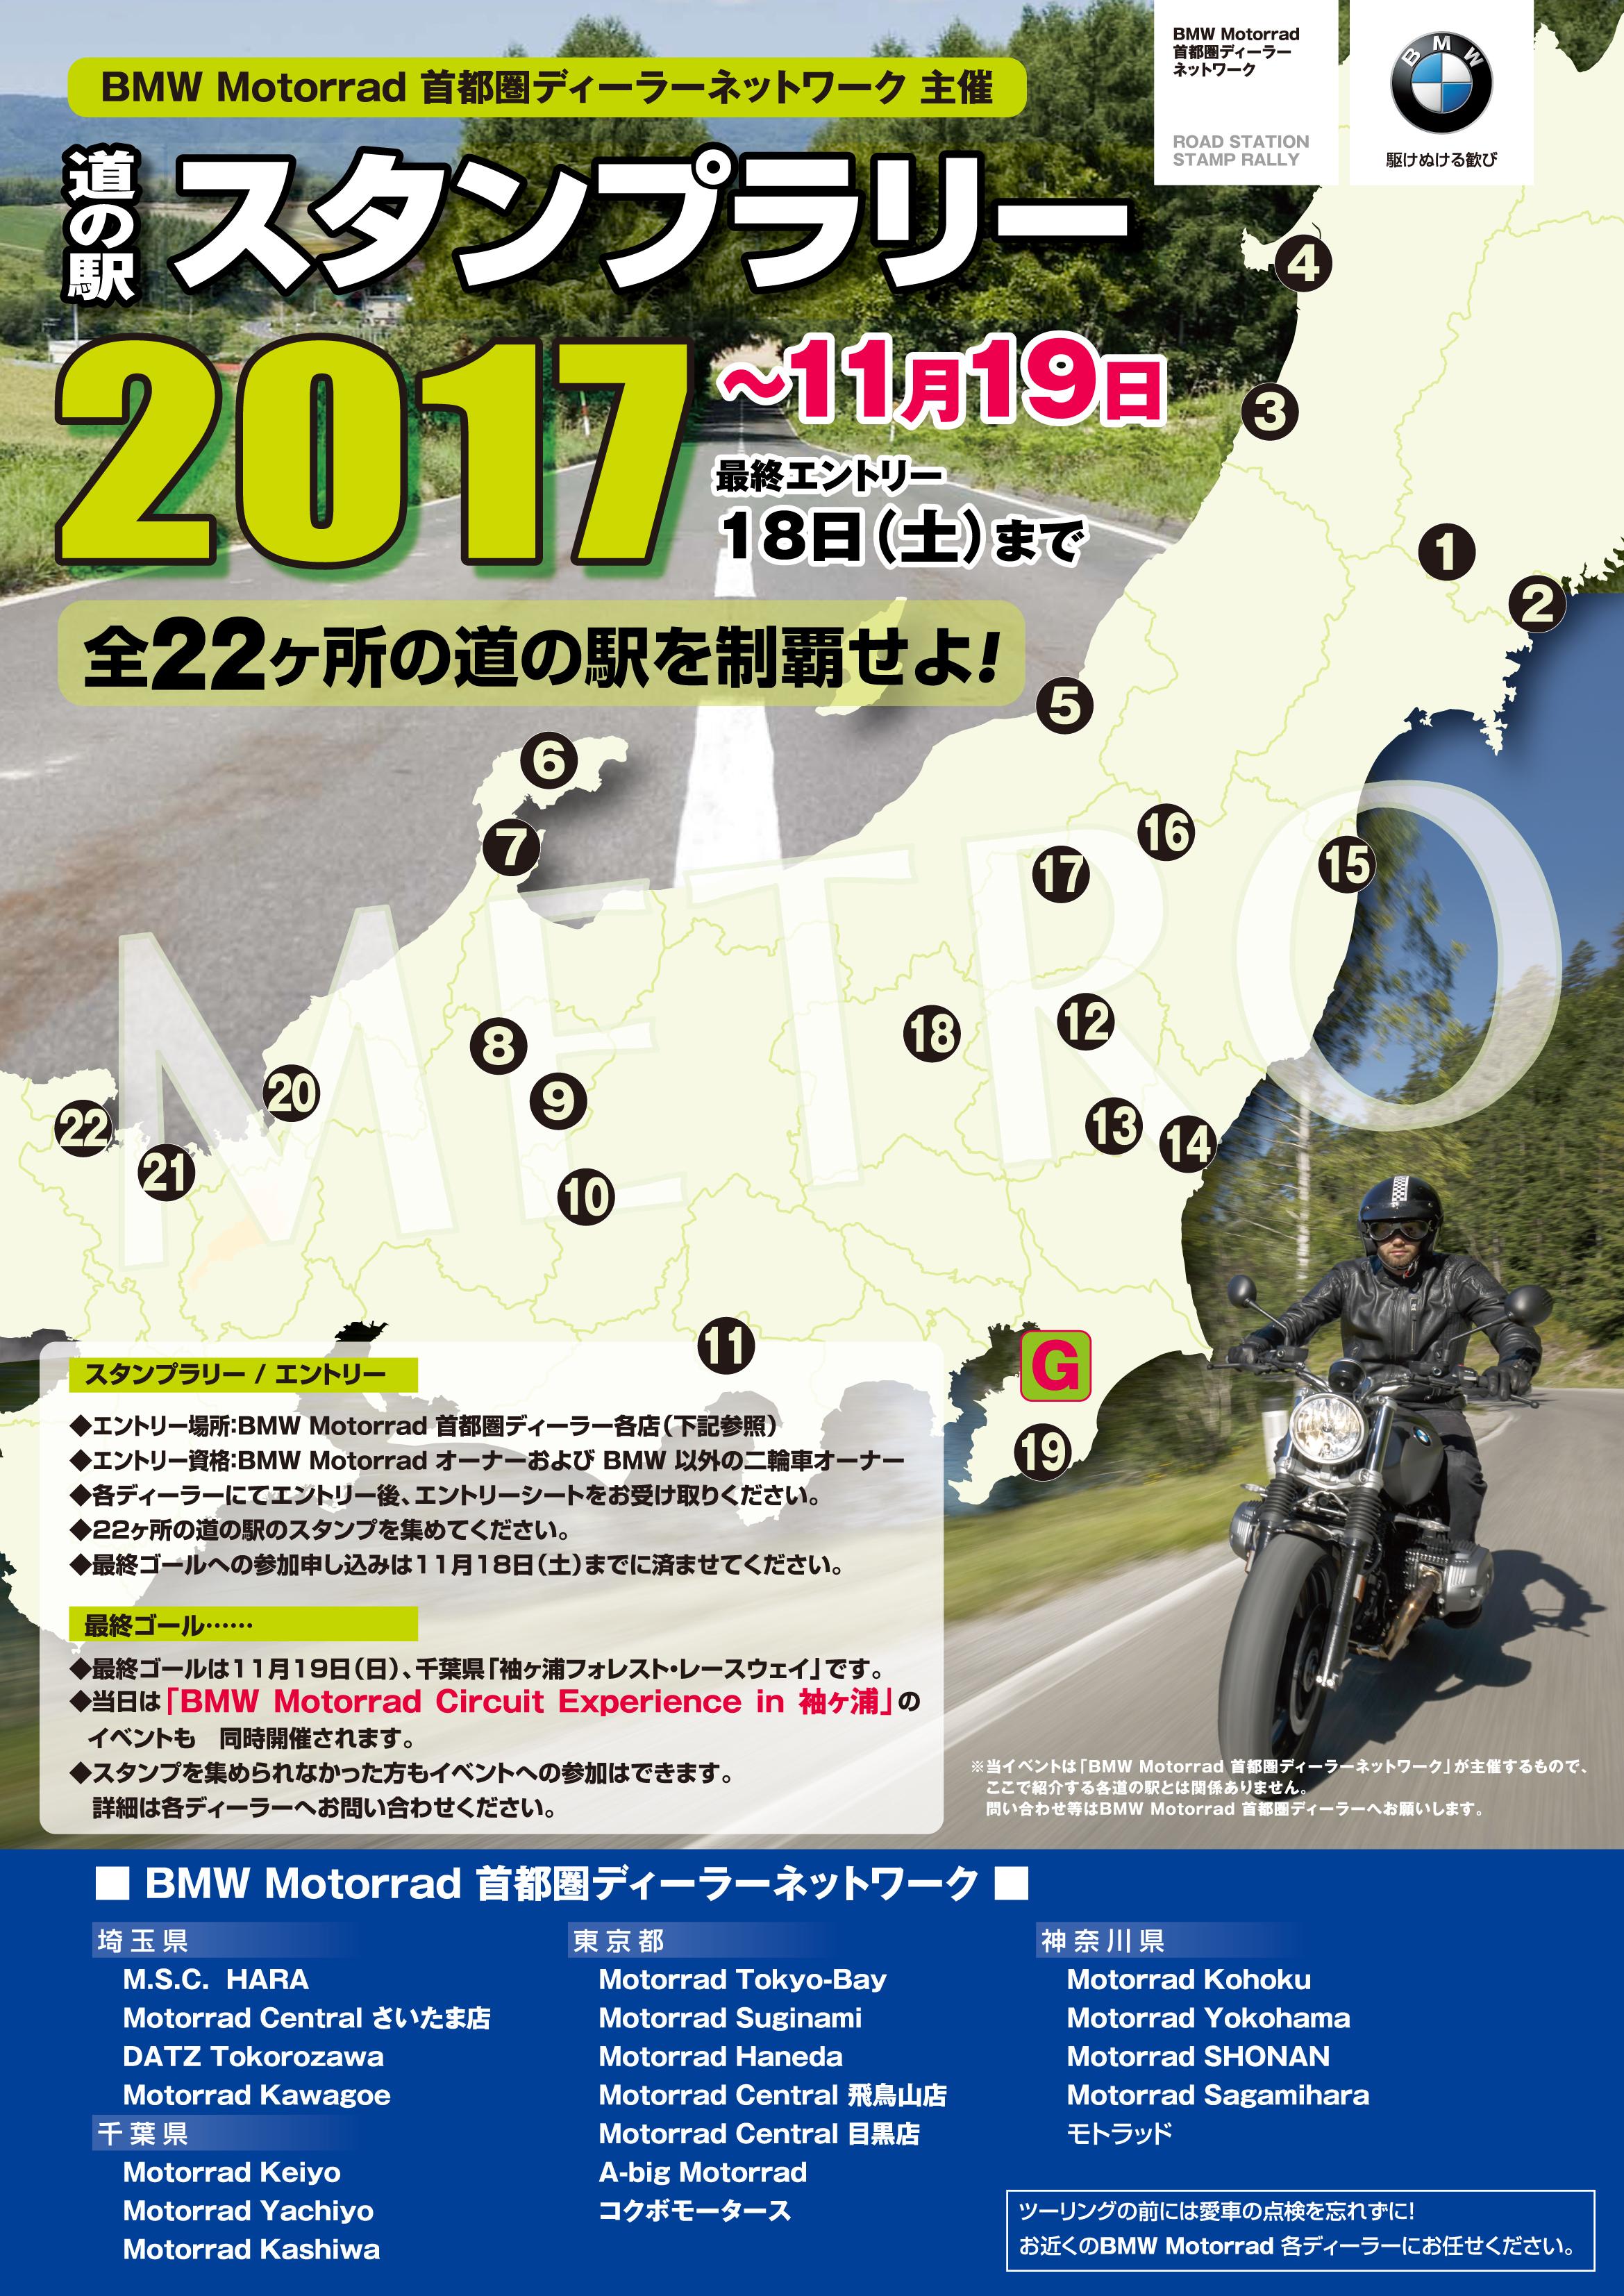 20170517165602c37.jpg